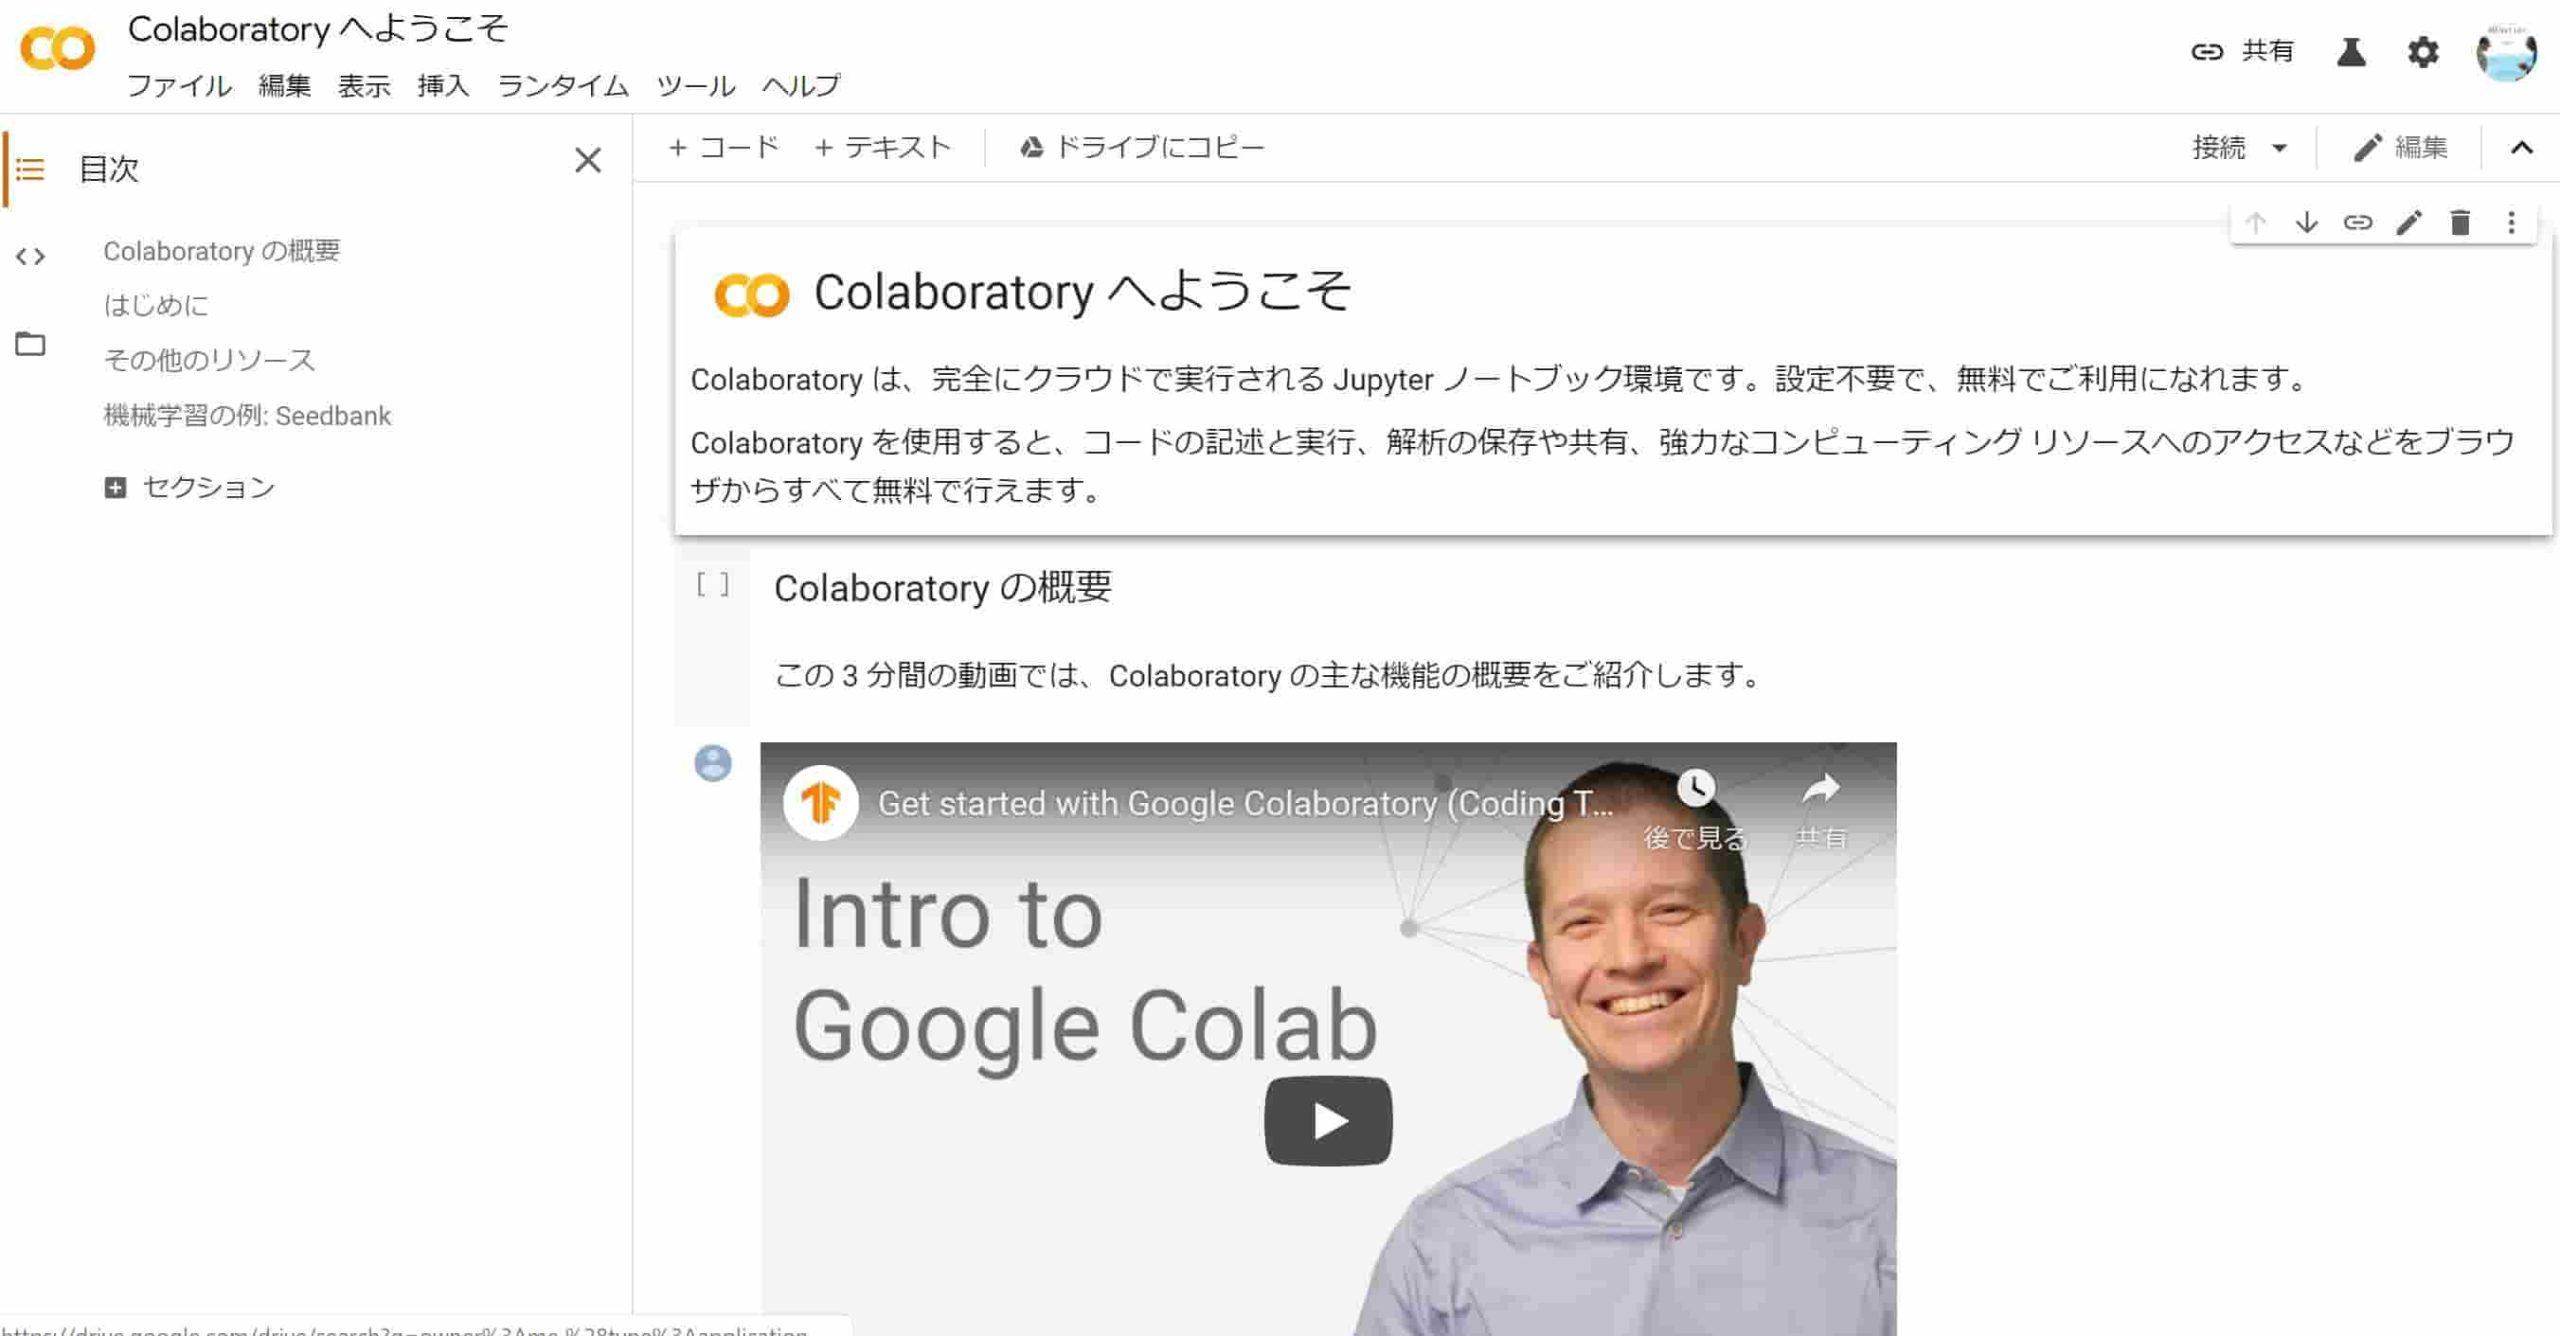 Google Colaboratory ホーム